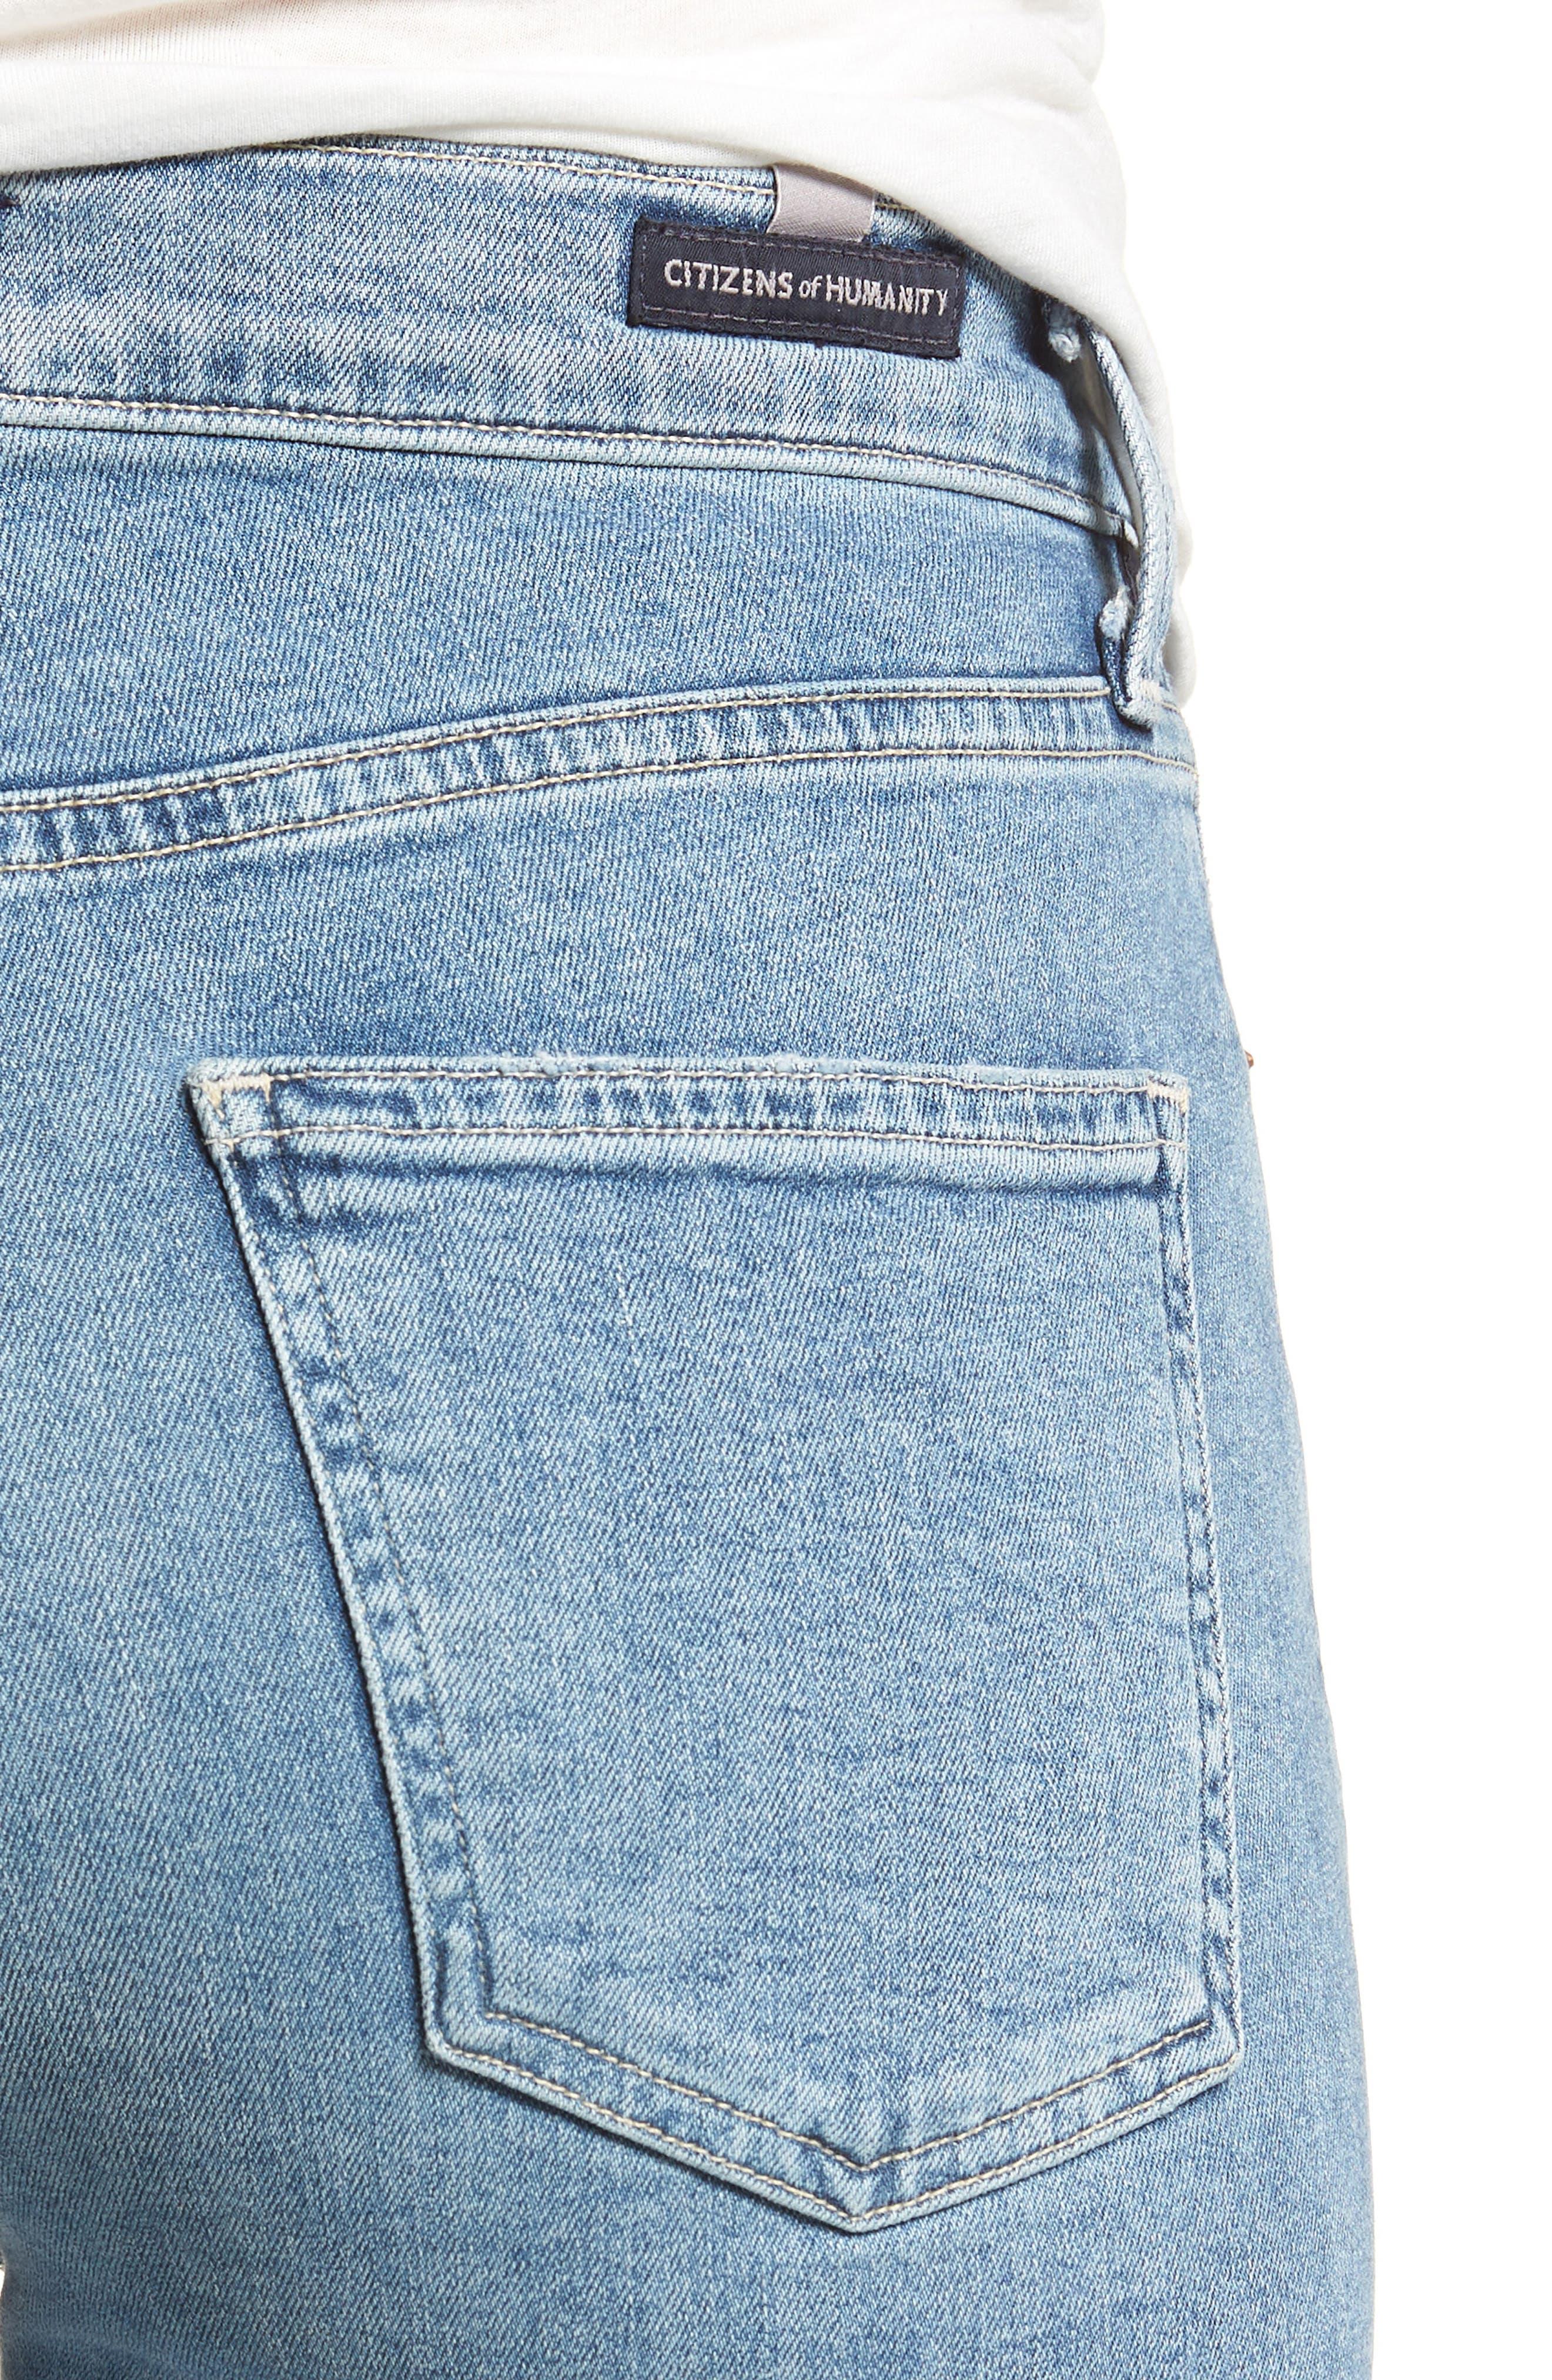 Cara Ankle Cigarette Jeans,                             Alternate thumbnail 4, color,                             457